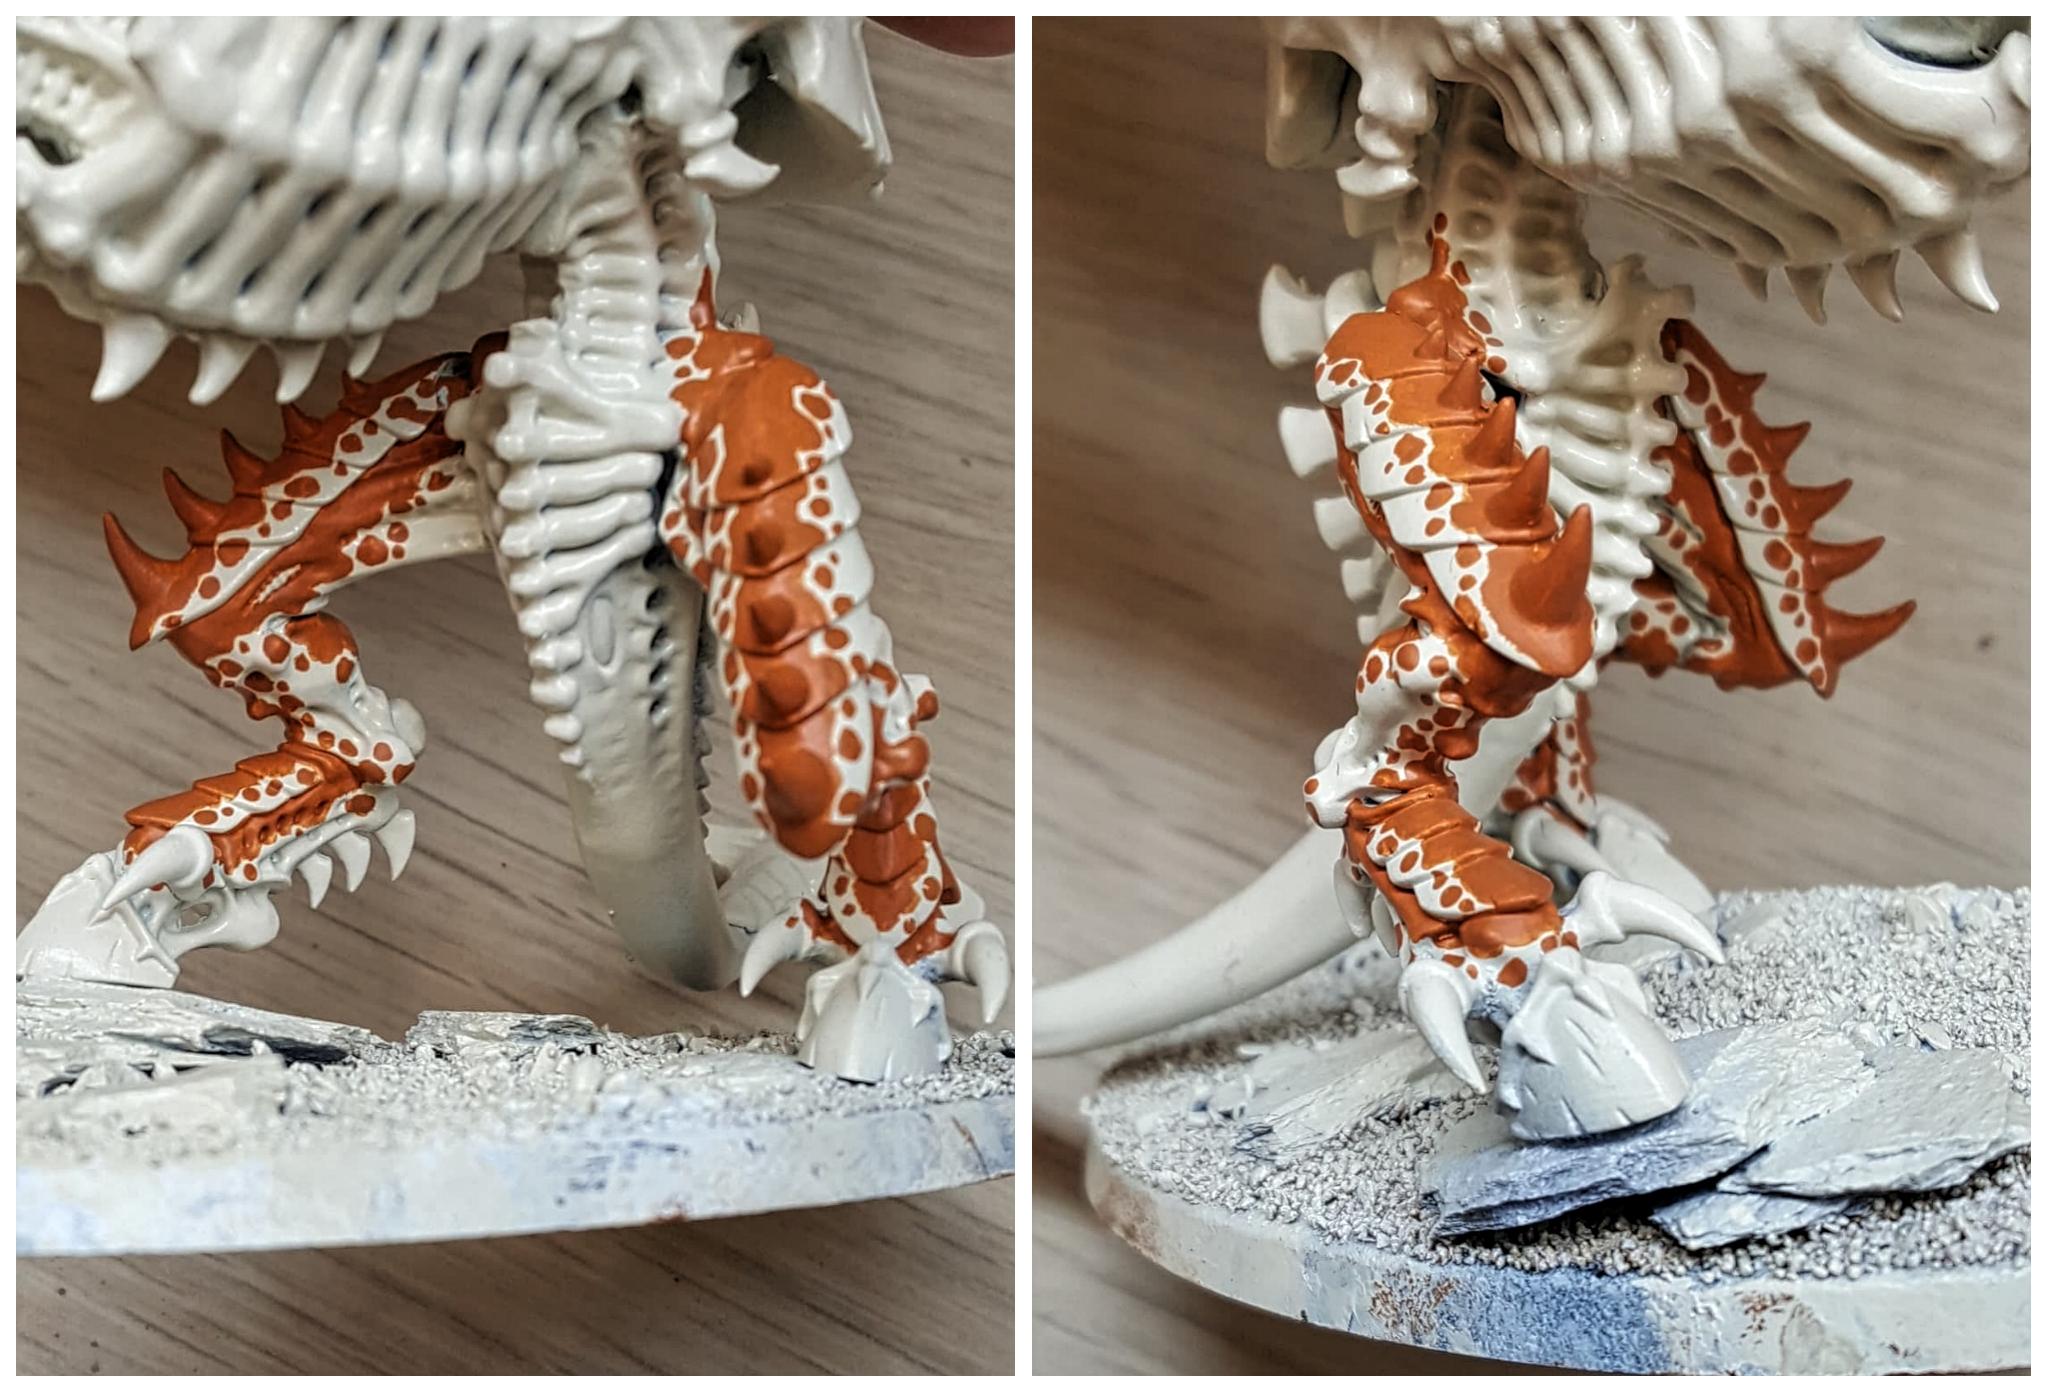 Carnifex leg details